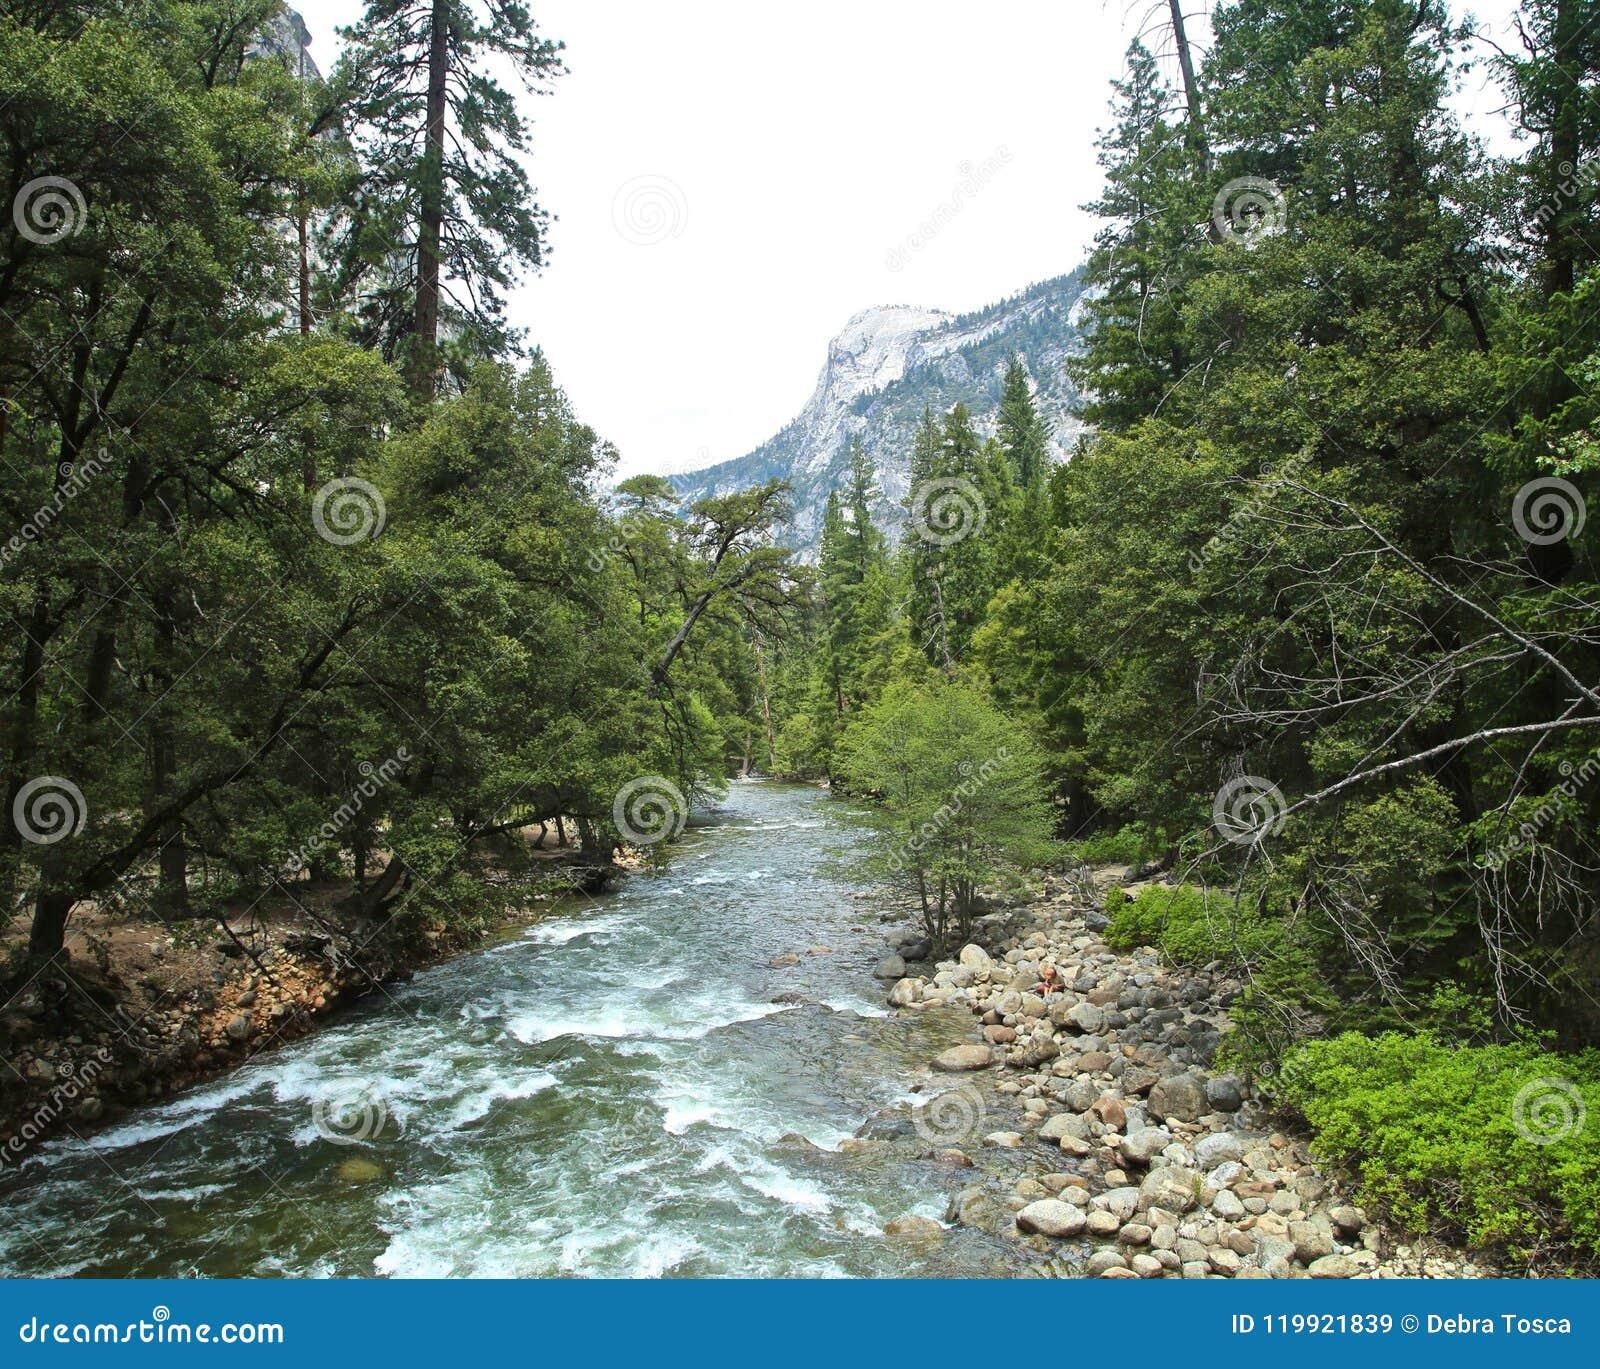 Yosemite National Park Rivers: Yosemite National Park River Stock Image